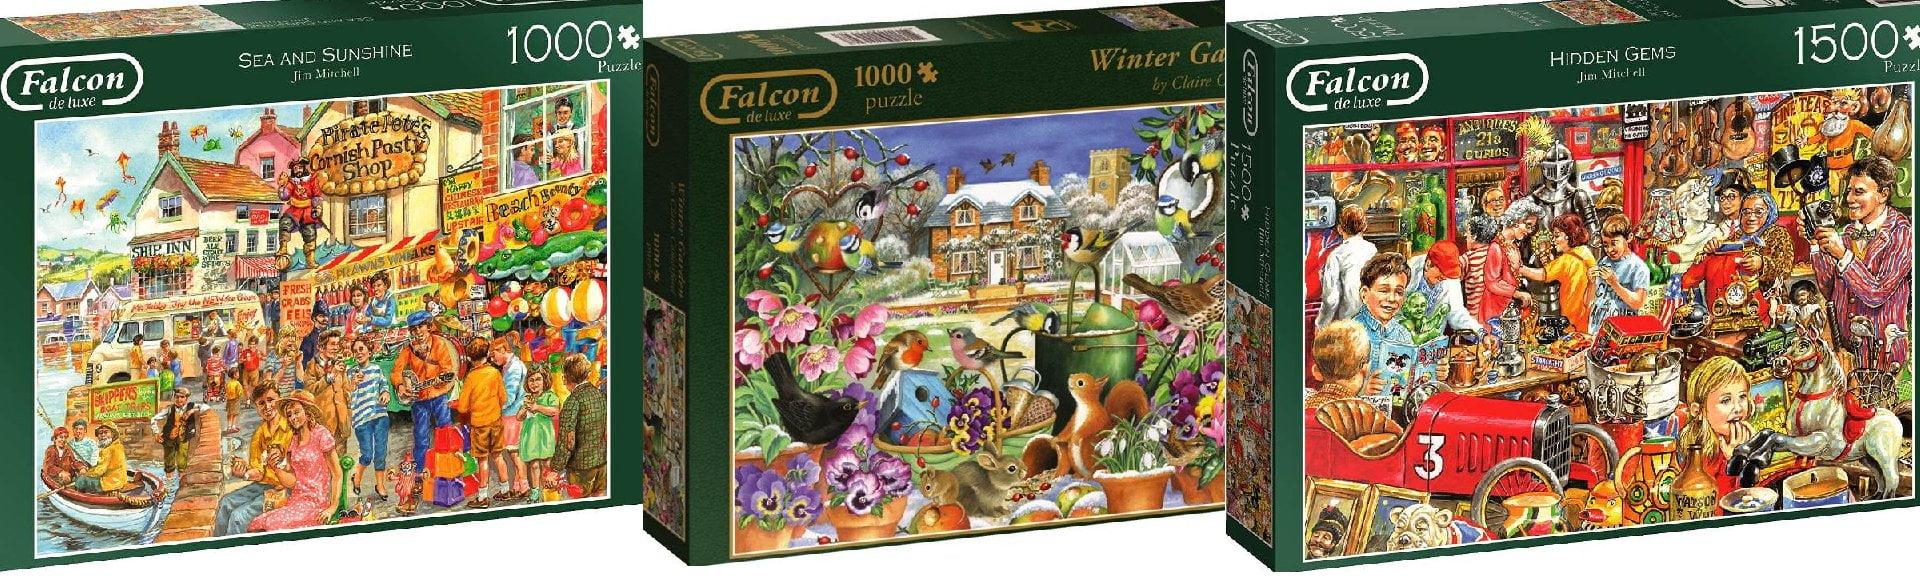 puzzle palace australia jigsaw puzzles australia jigsaw puzzles